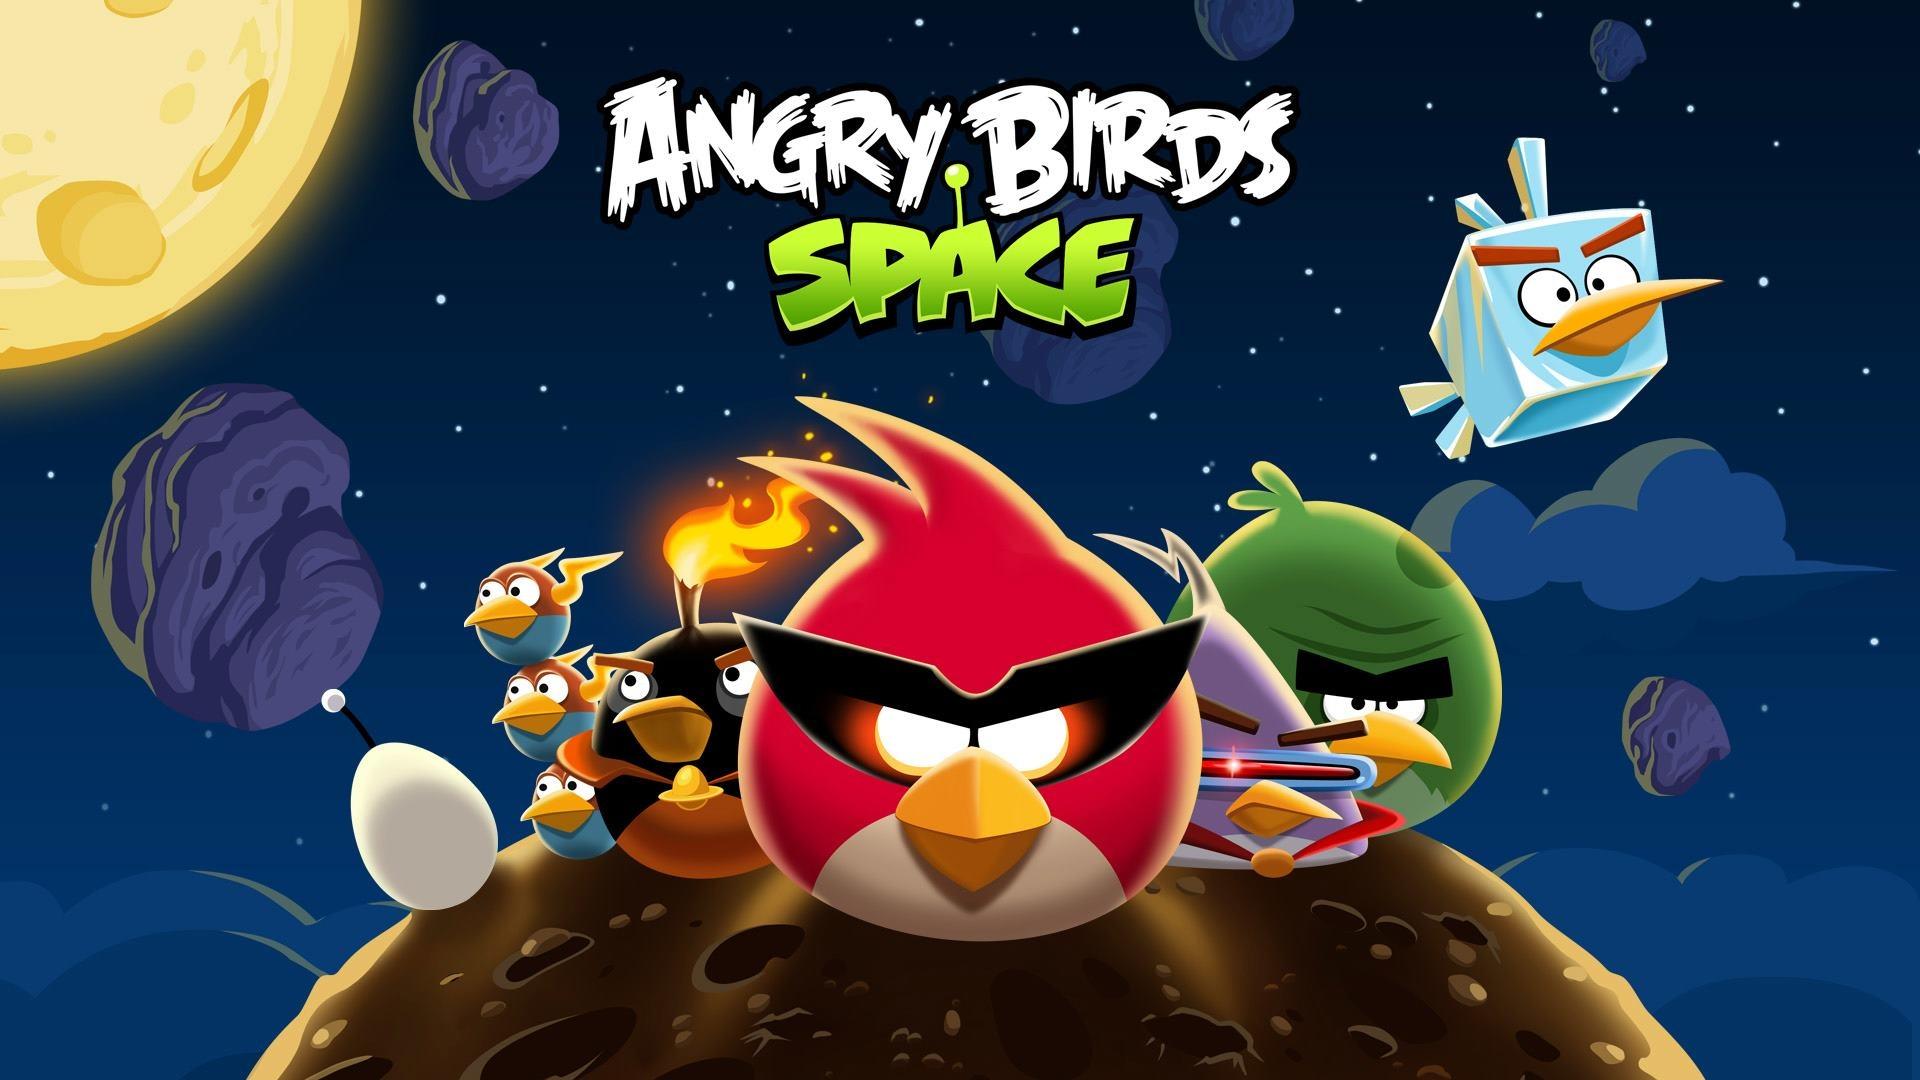 Angry Birds Weltraum 1920x1080 Full HD 2K Hintergrundbilder, HD, Bild